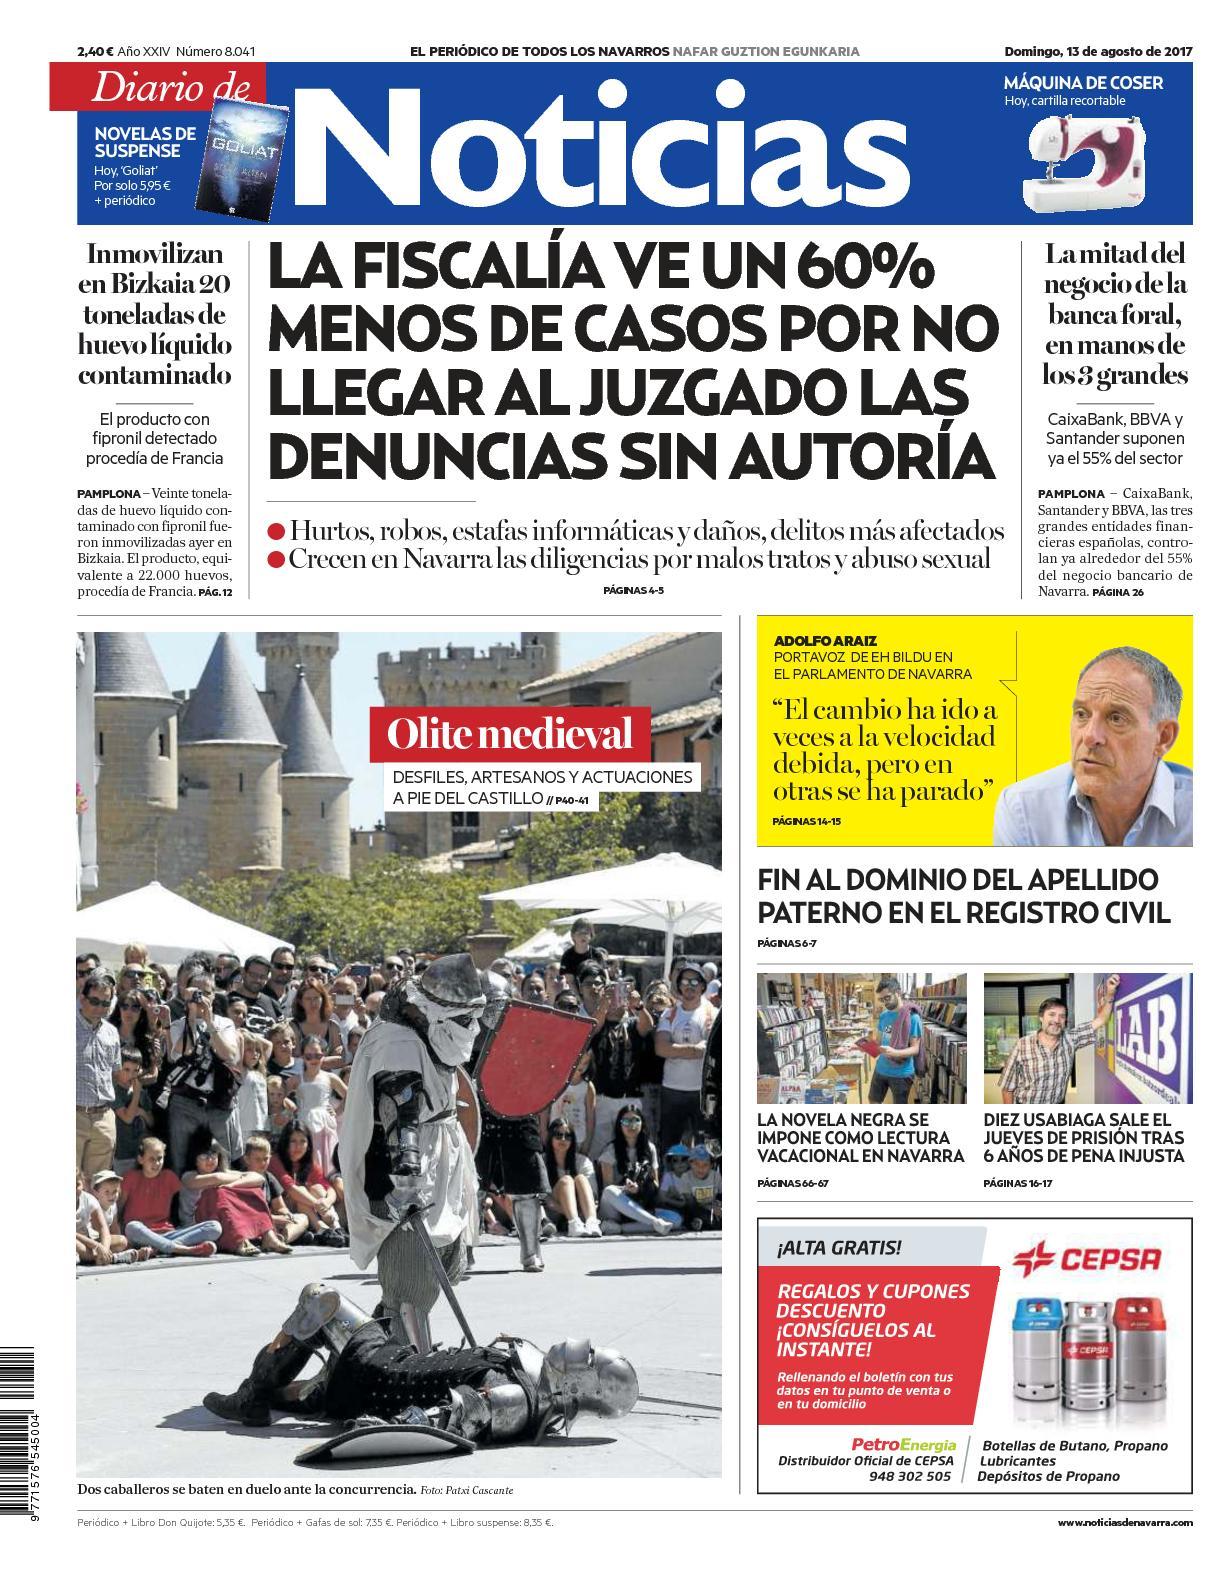 Andrea Garcia Xtremo calaméo - diario de noticias 20170813